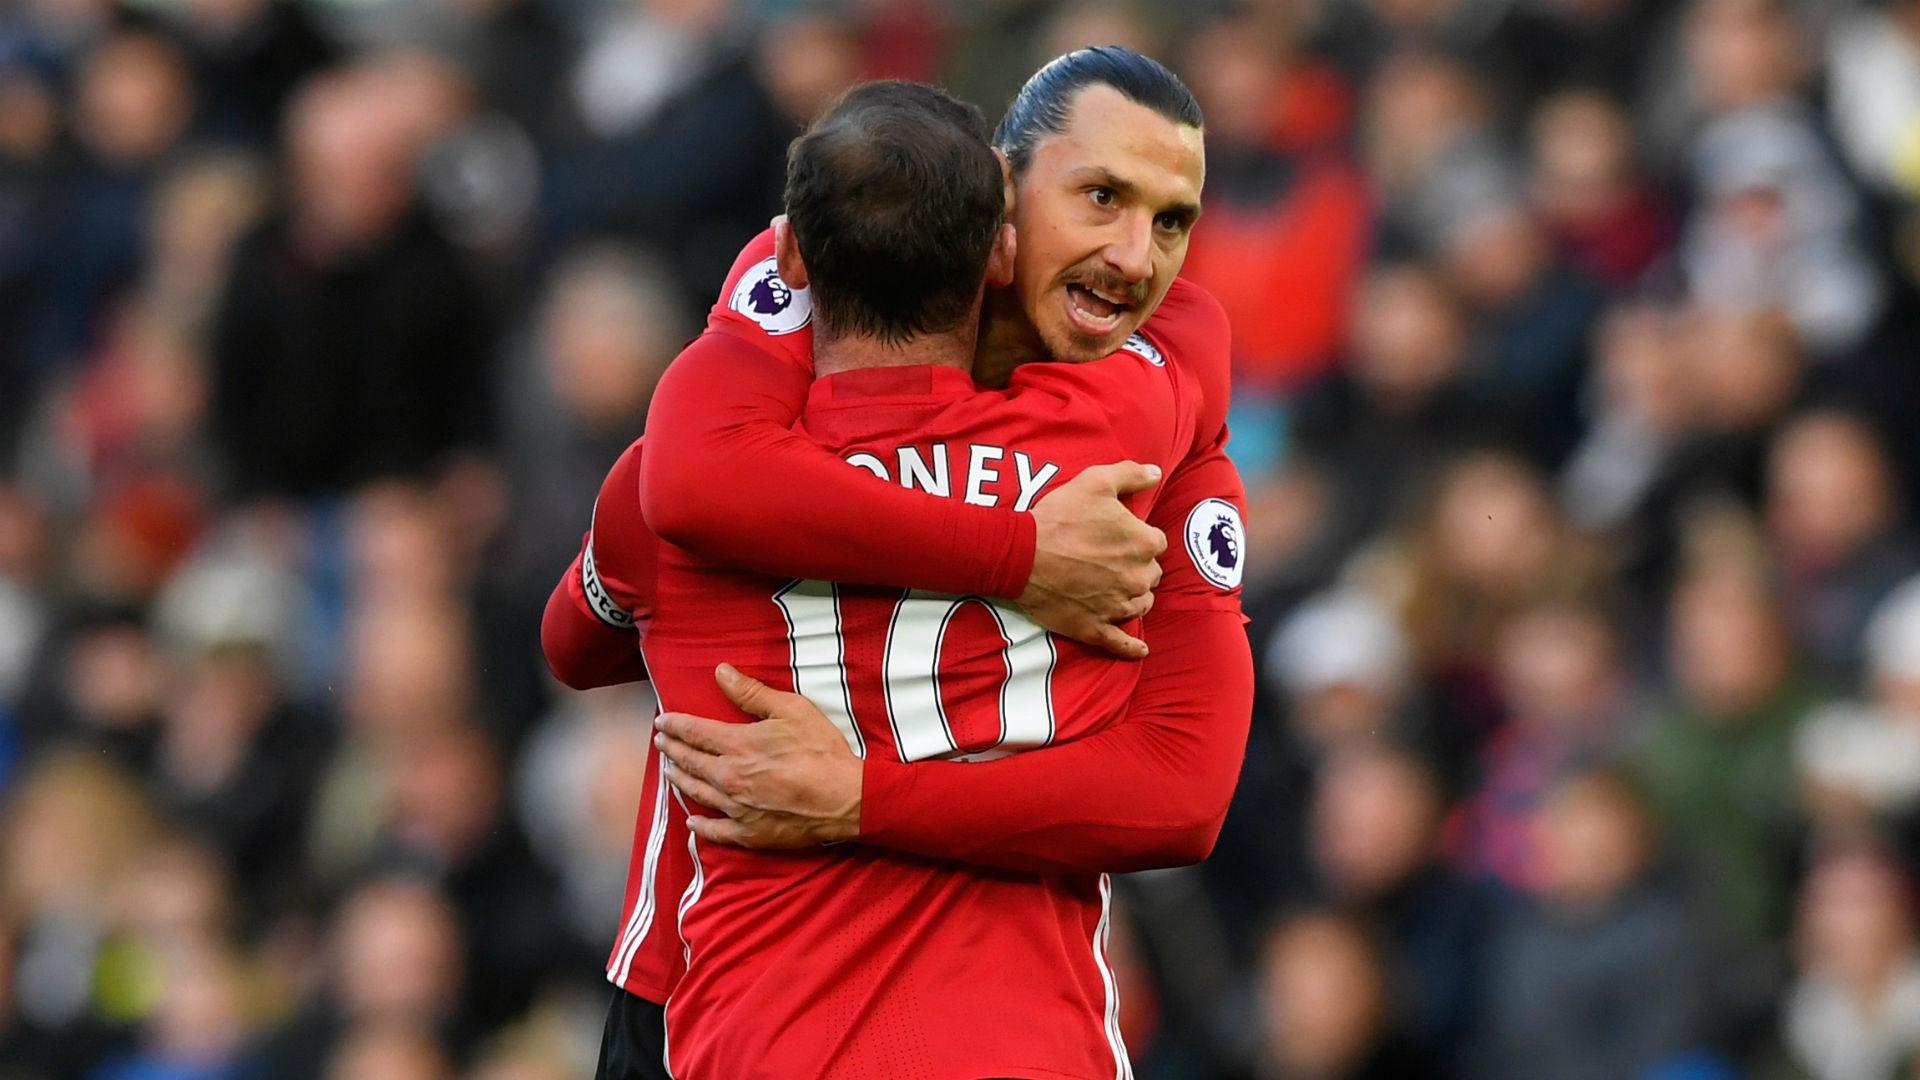 Wayne Rooney Zlatan Ibrahimovic Manchester United